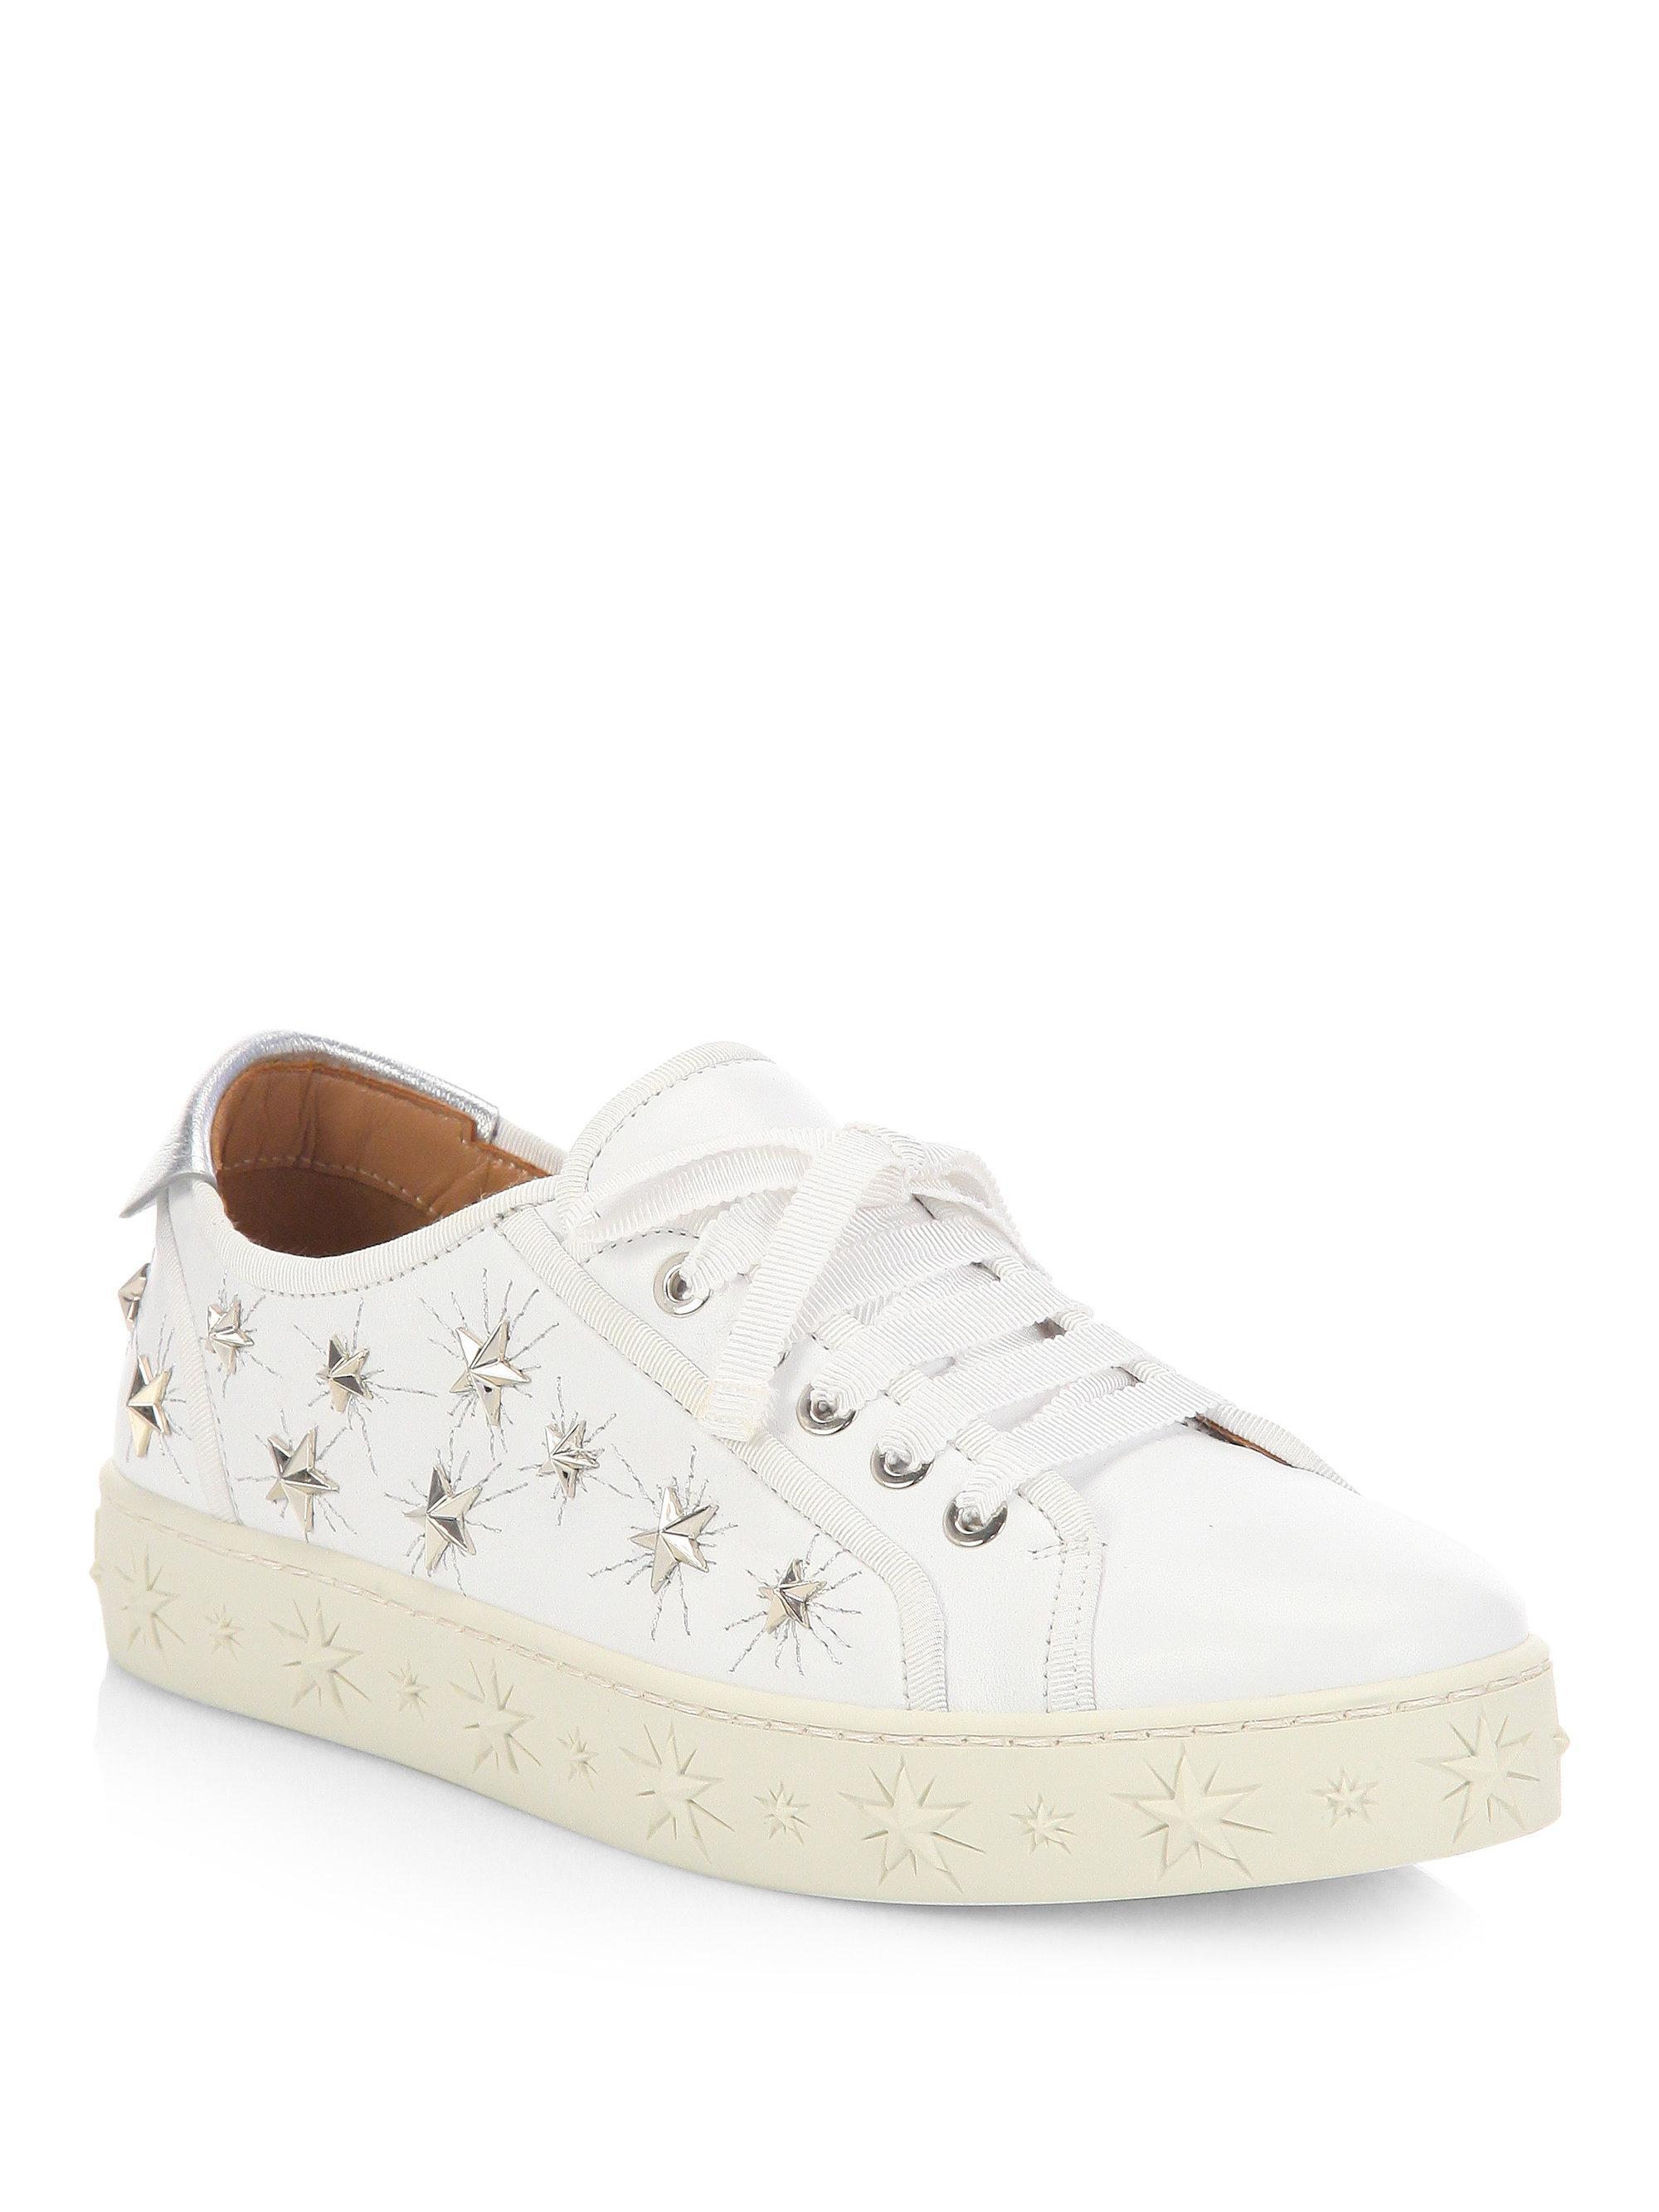 Aquazzura Cosmic Star leather sneakers az59U5lVF